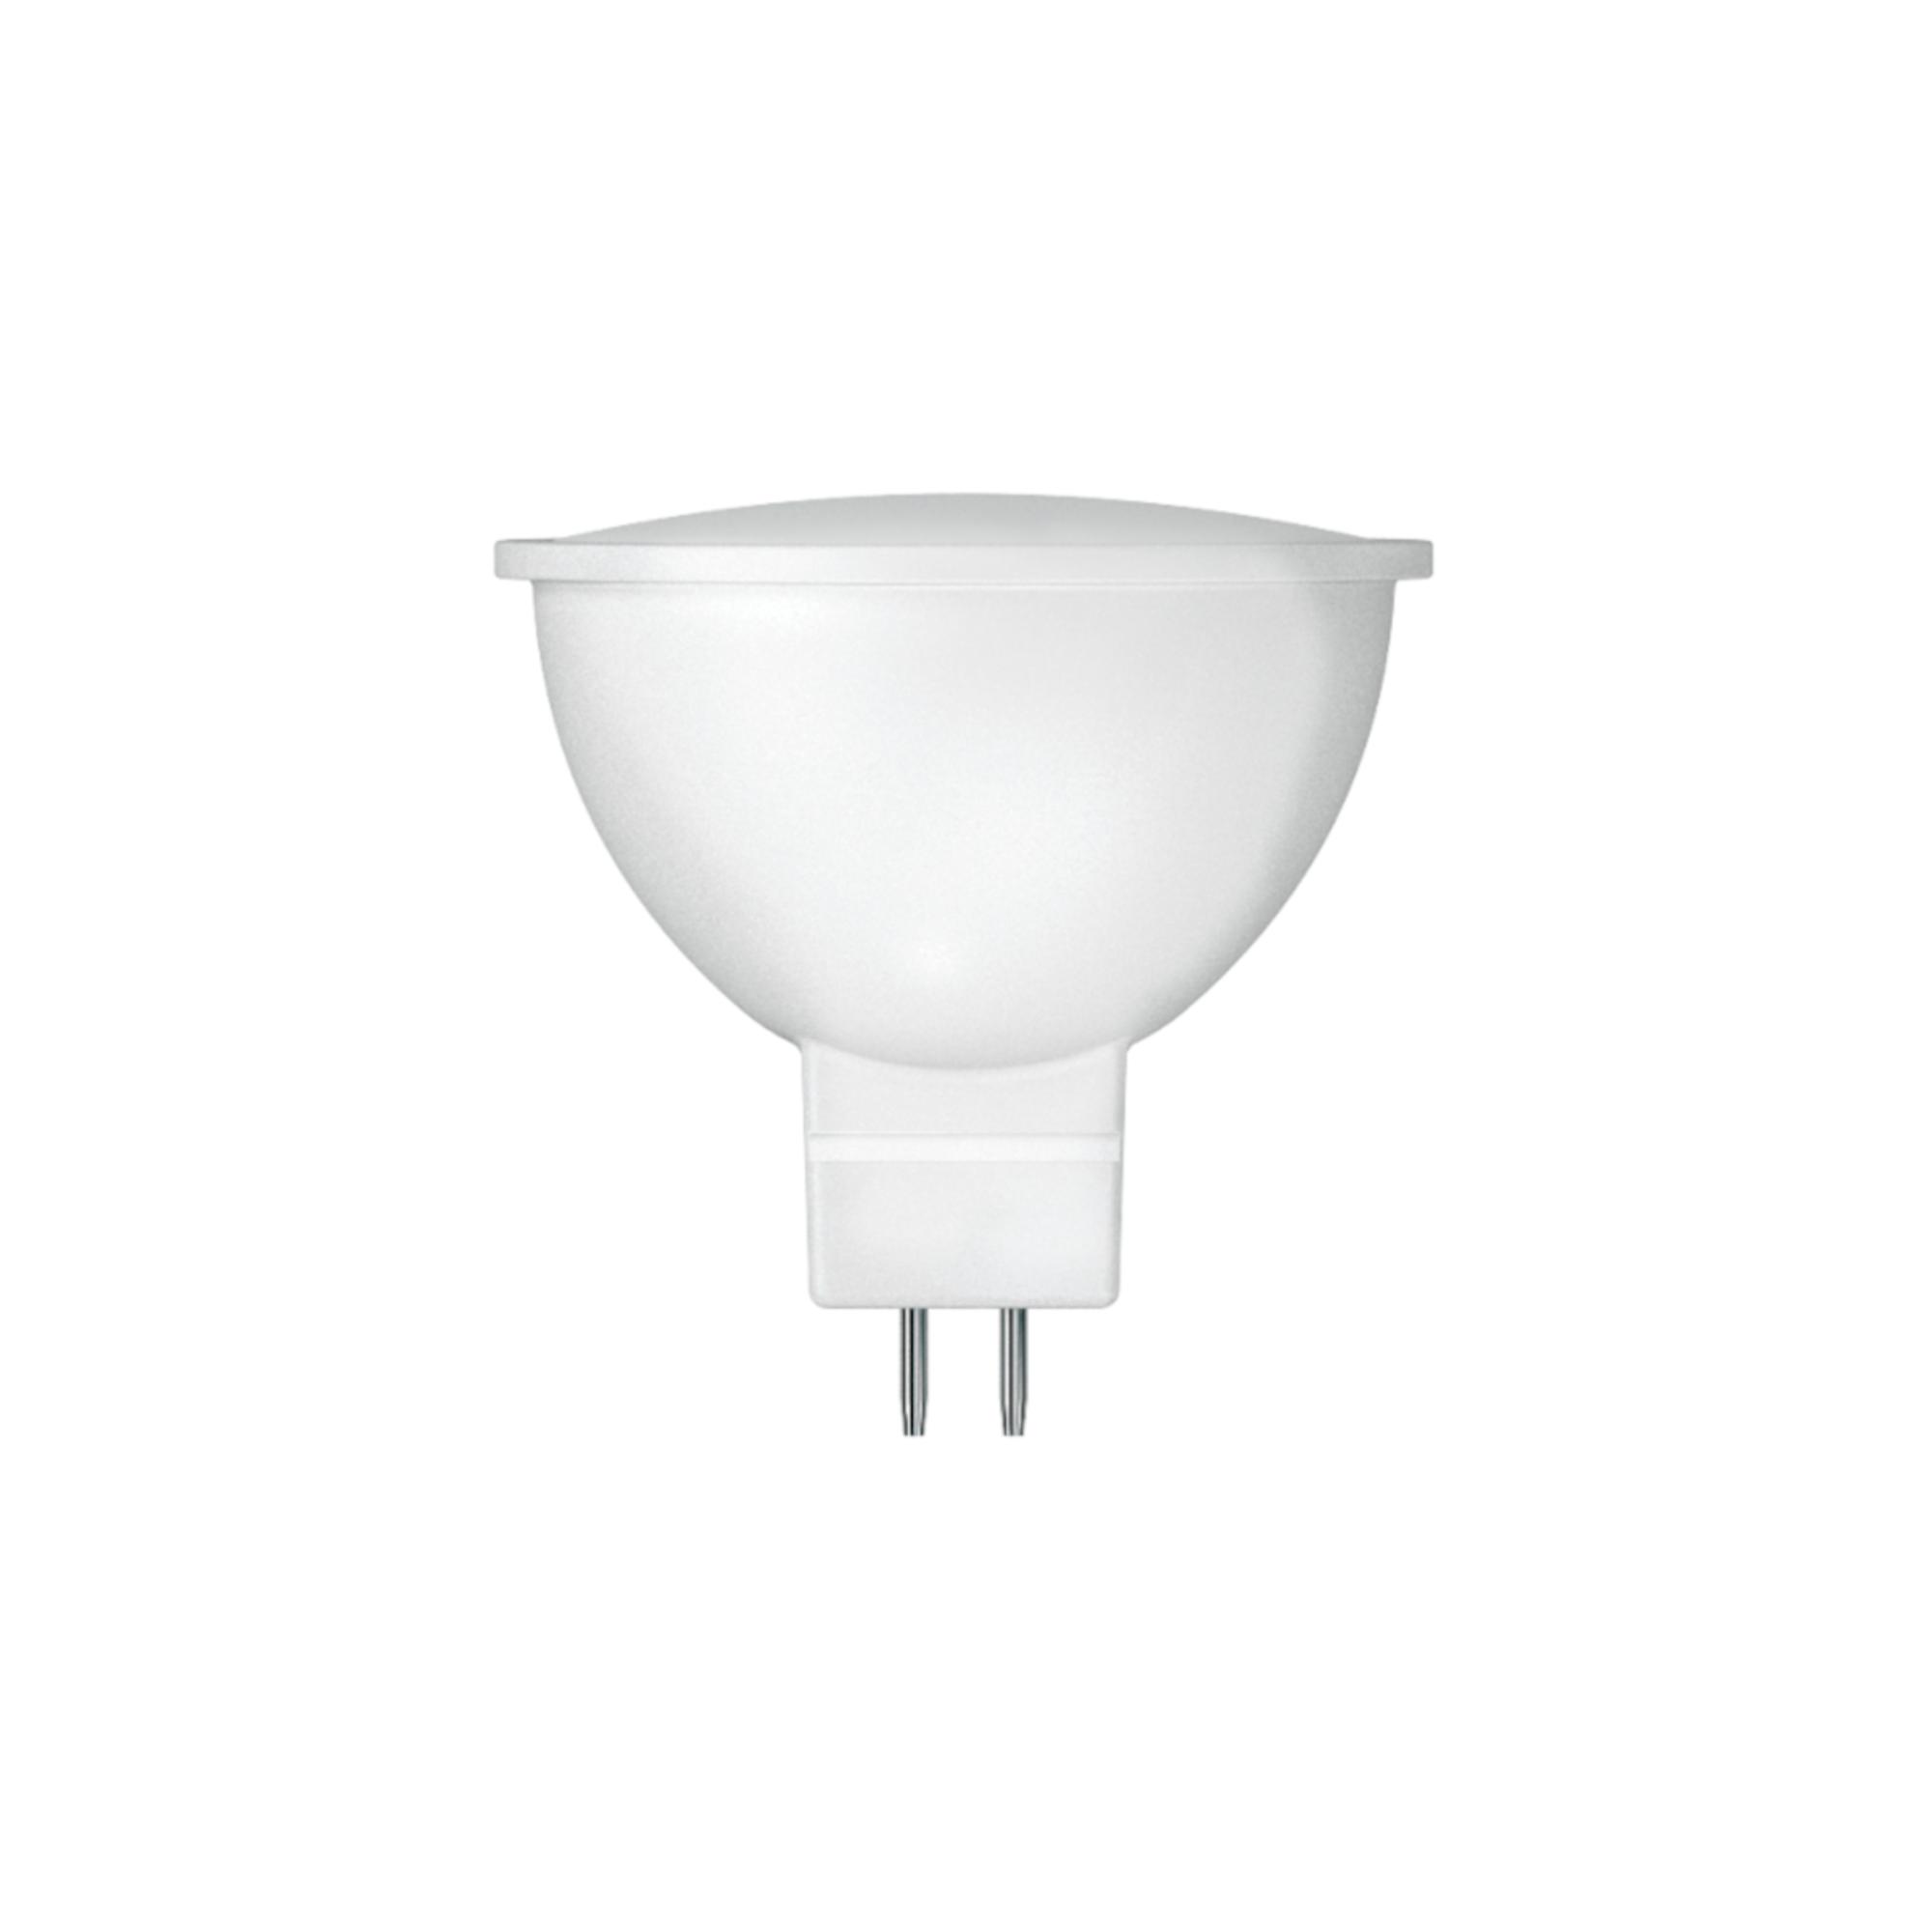 Лампа Светодиодная  Фотон LED MR16 7W GU5.3 3000K